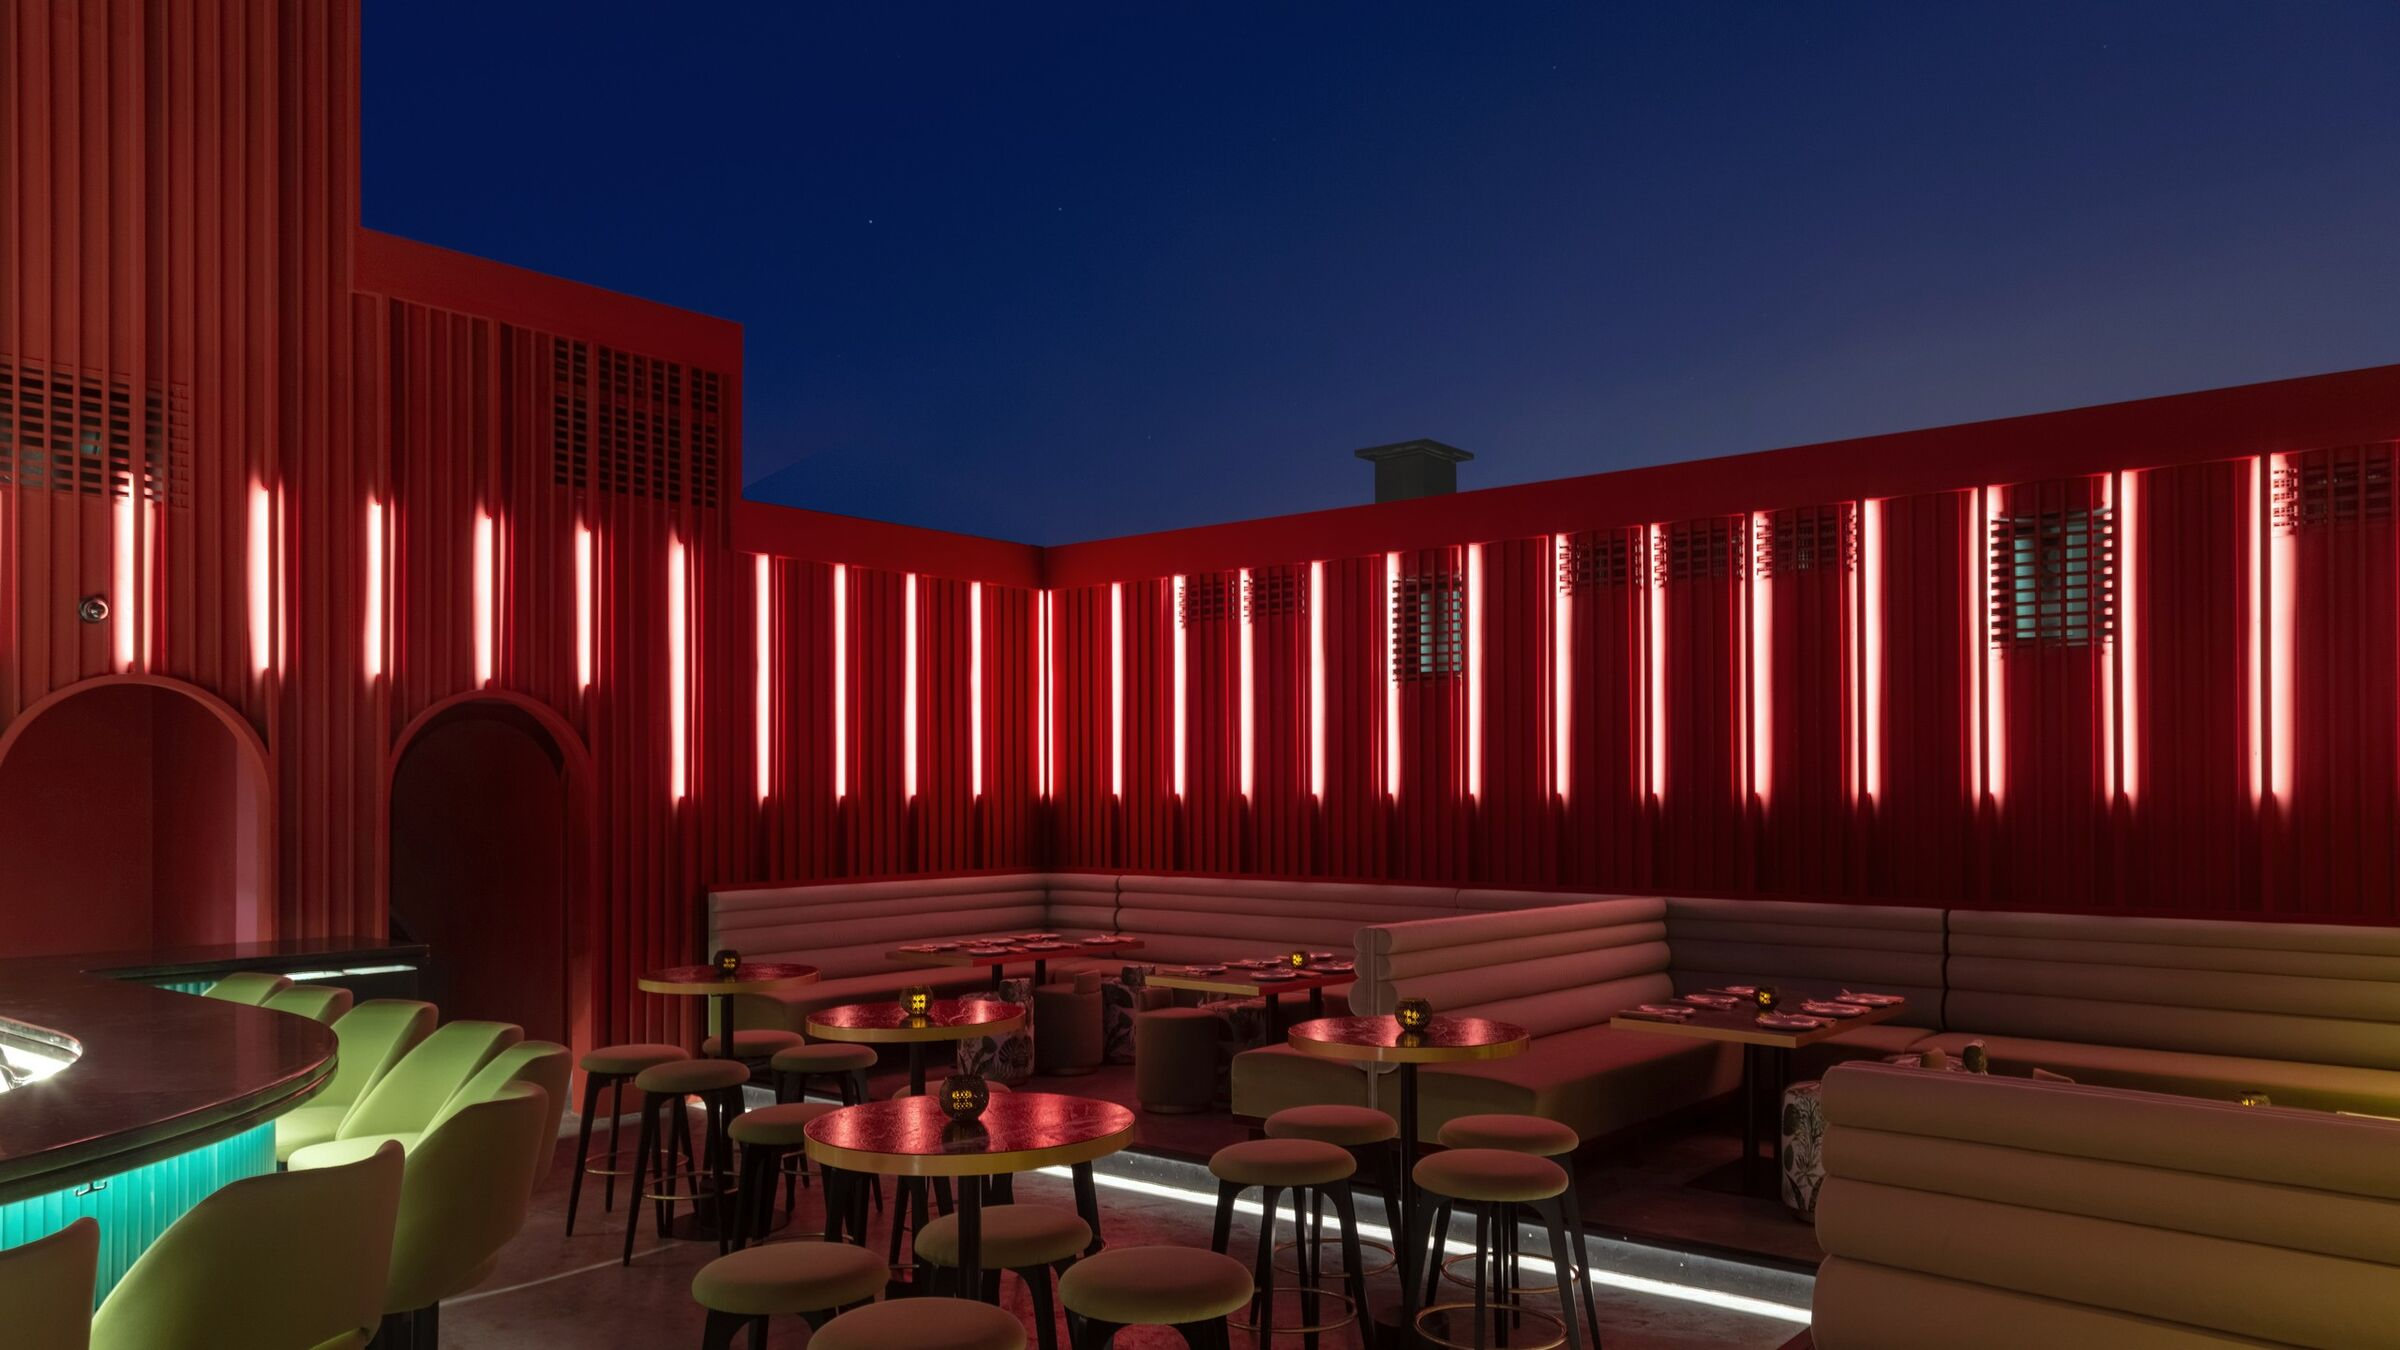 Bau Rooftop Lounge Bar Rabih Geha Architects Rg Architects Midia Fotos E Videos 4 Archello